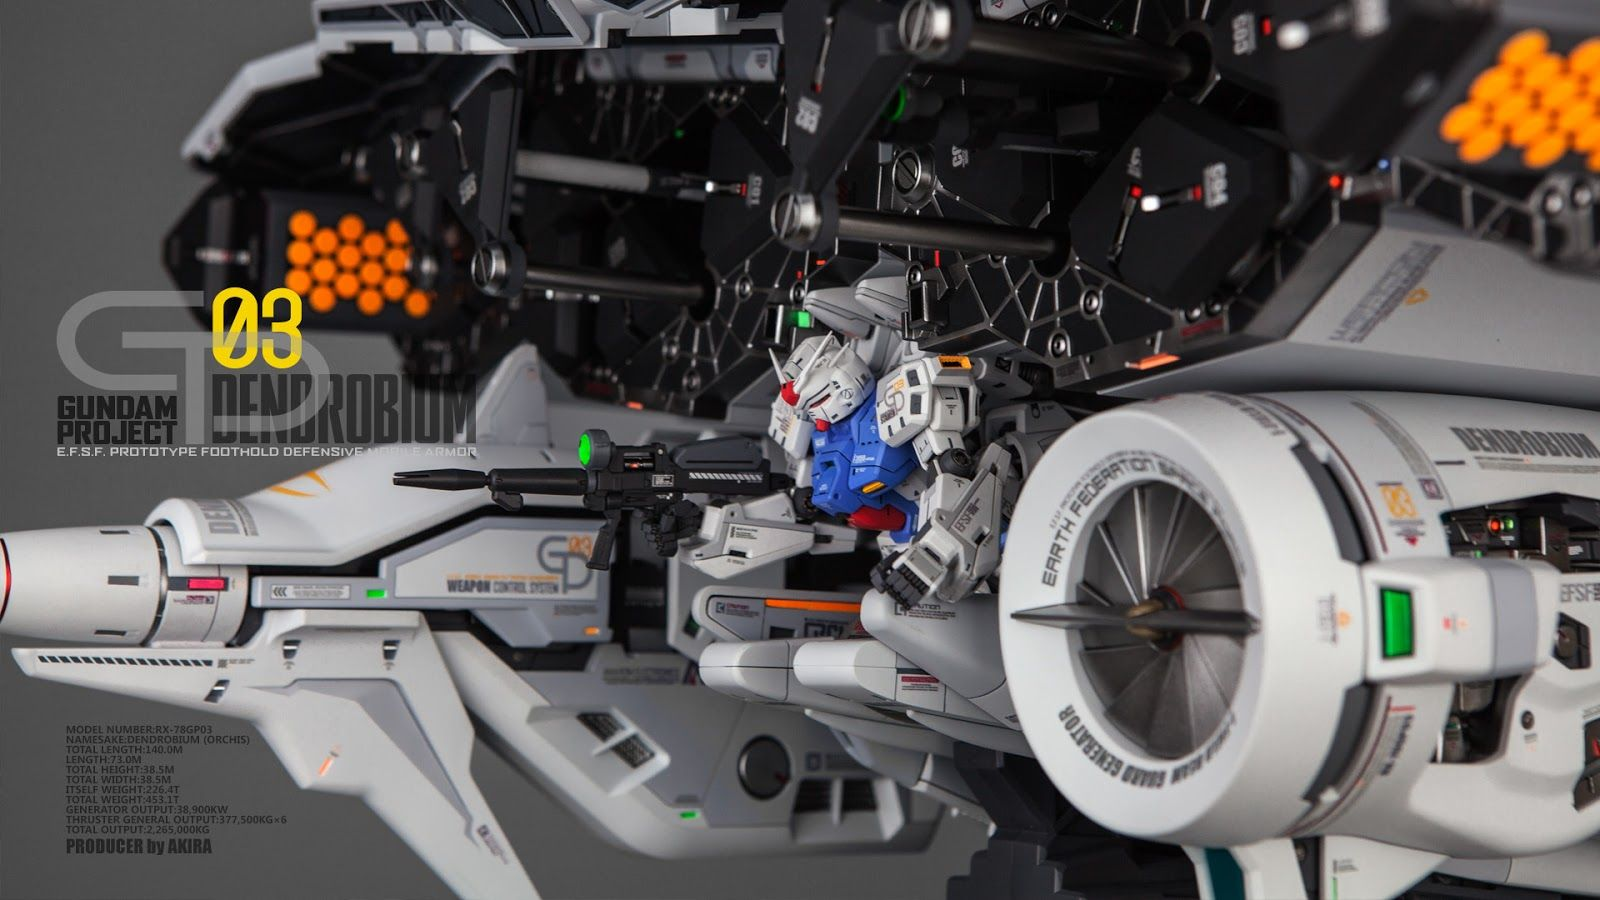 Custom Build Hguc 1 144 Rx 78 Gp03 Gundam Dendrobium Led Hg Mechanics Kits Collection News And Reviews